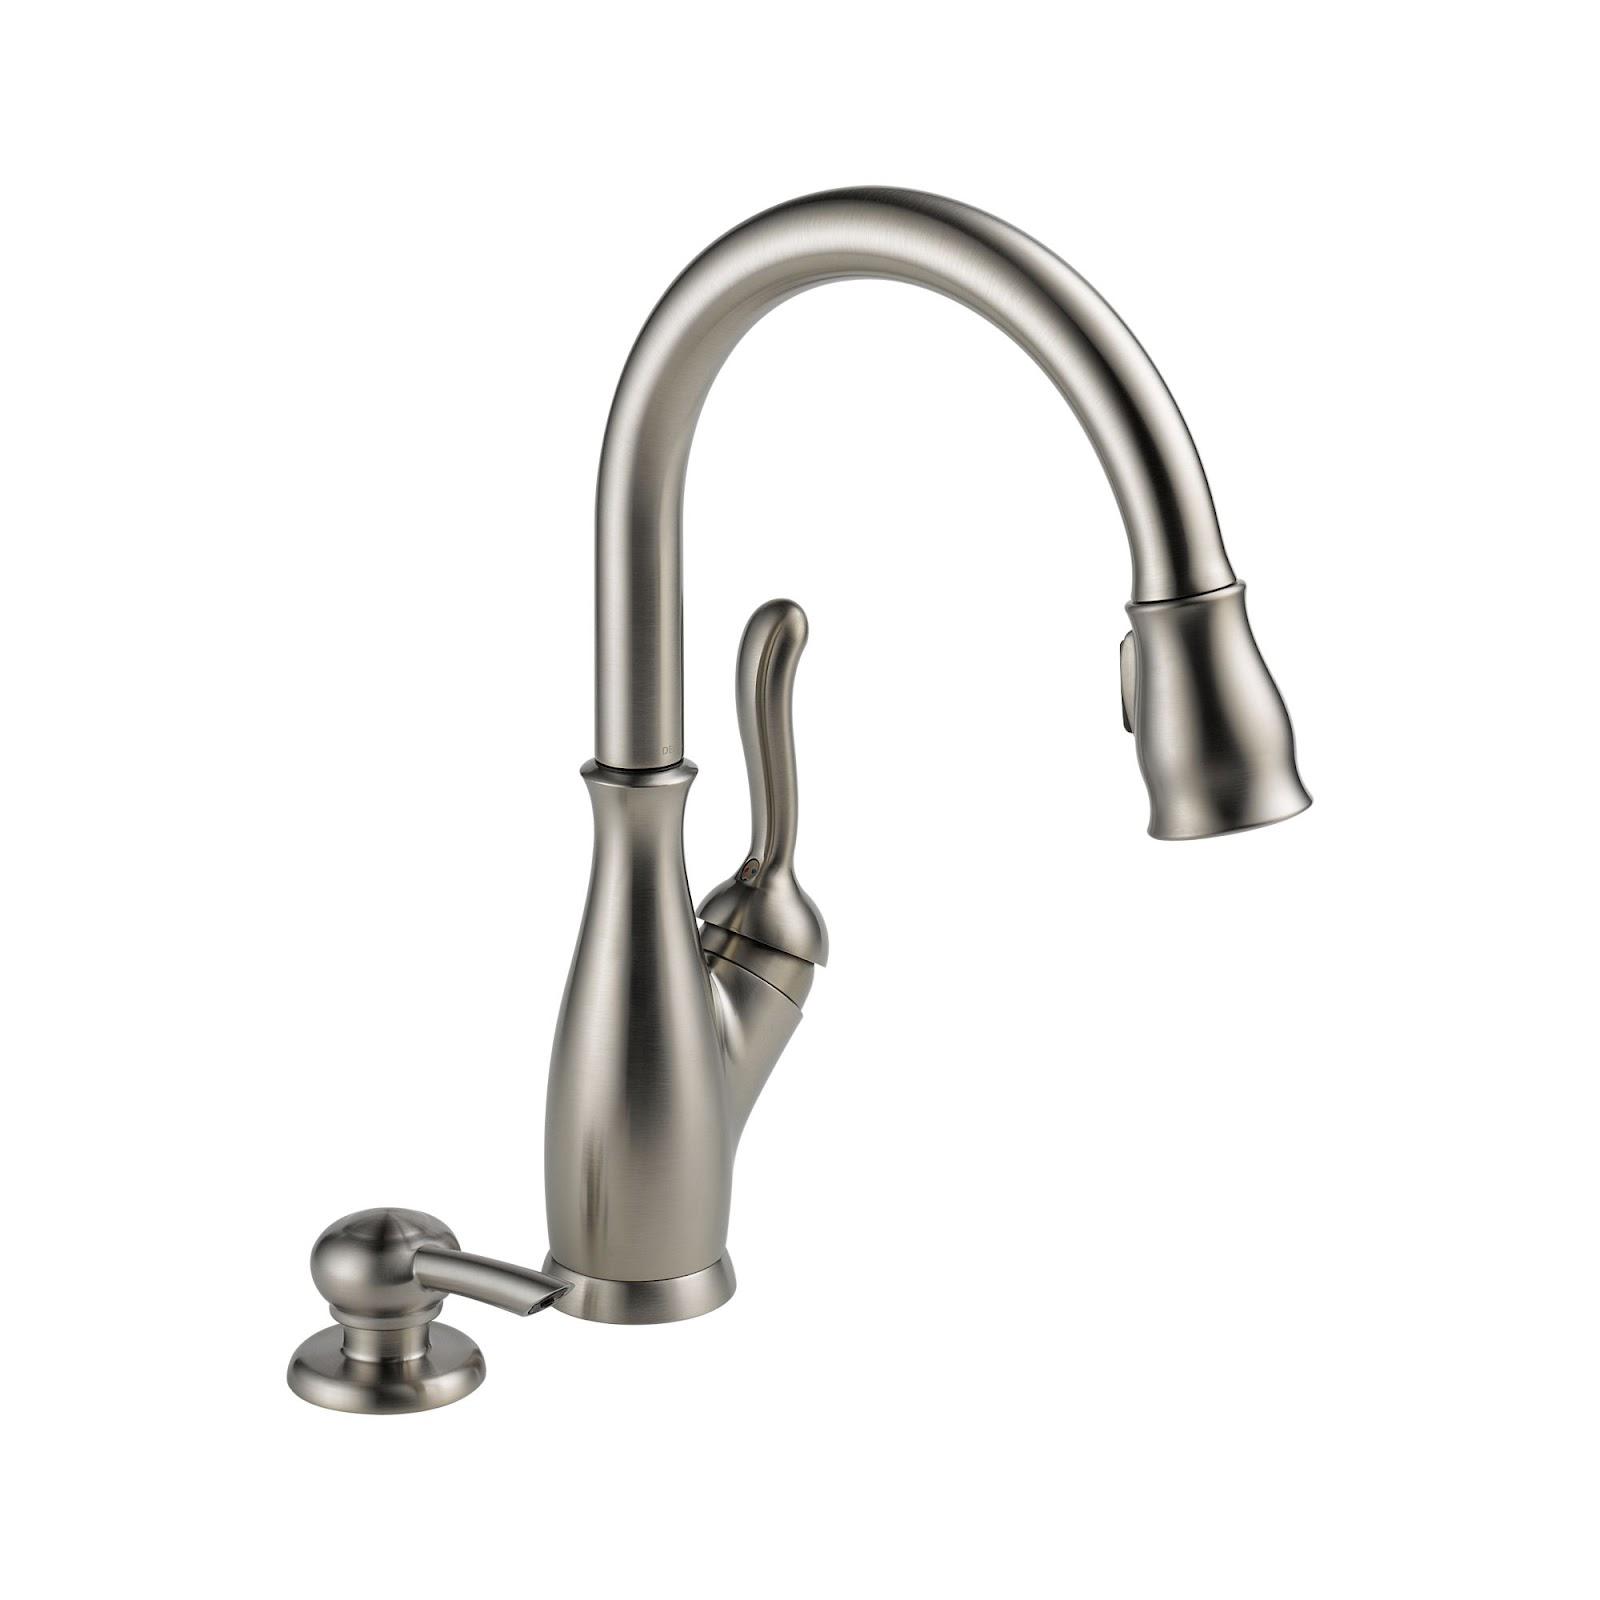 Delta Kitchen Sinks : Delta Leland 19978-sssd-dst Kitchen Faucet